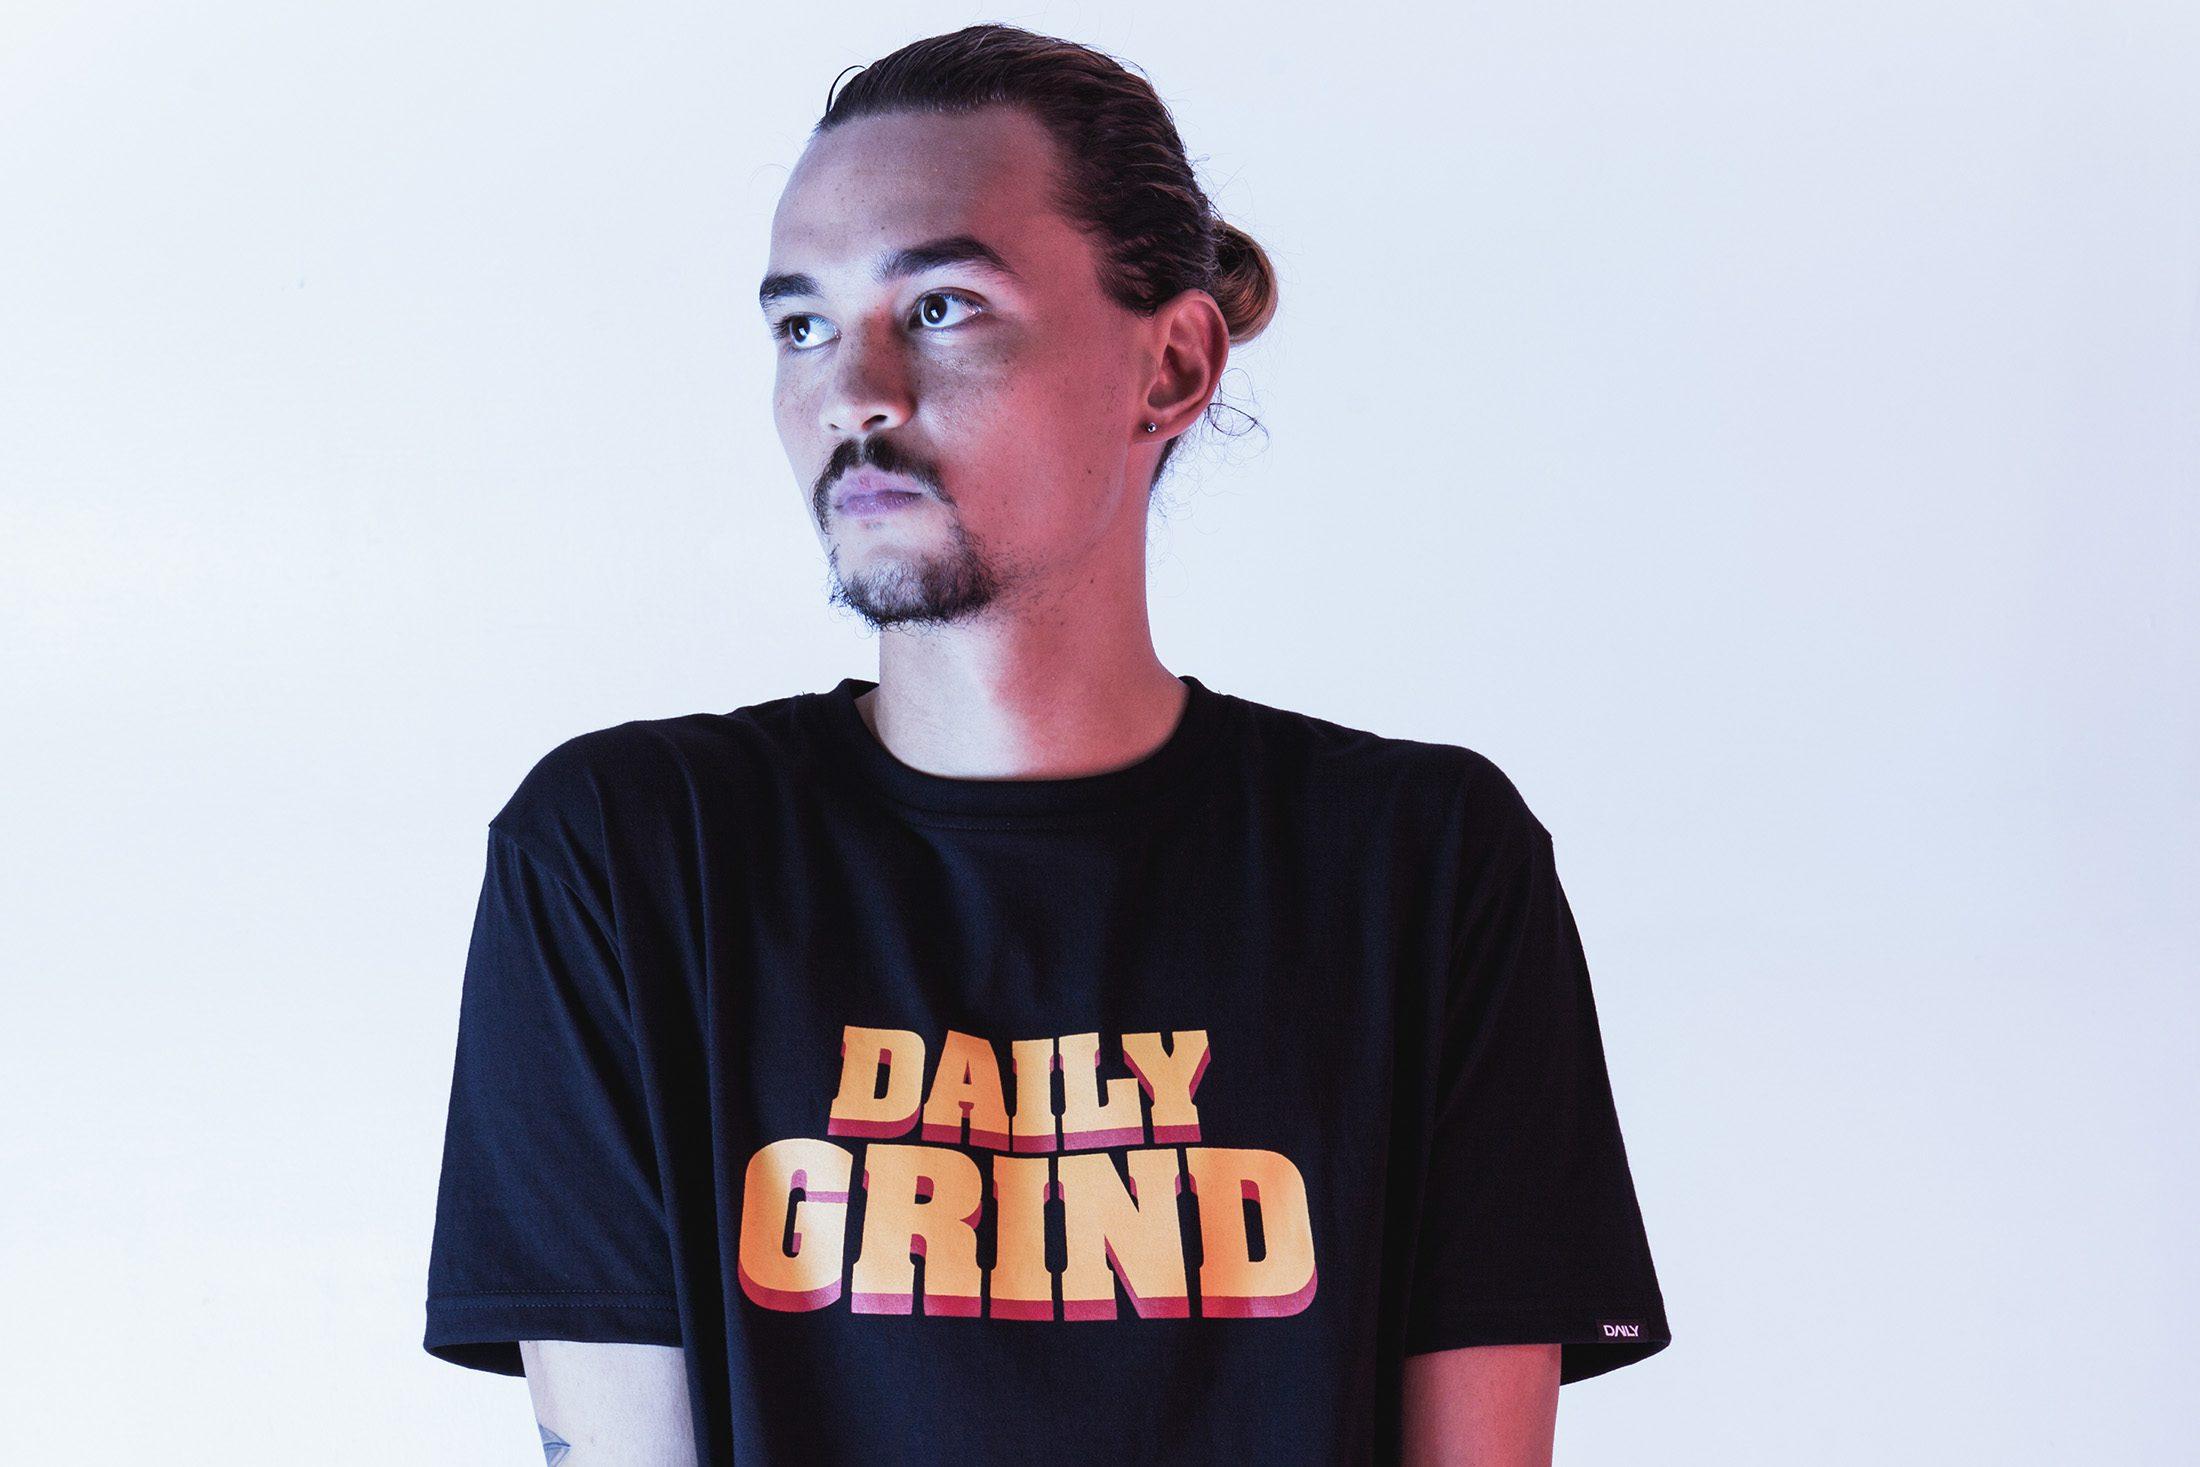 daily-grind-70d-007-2200x1467 copy 2